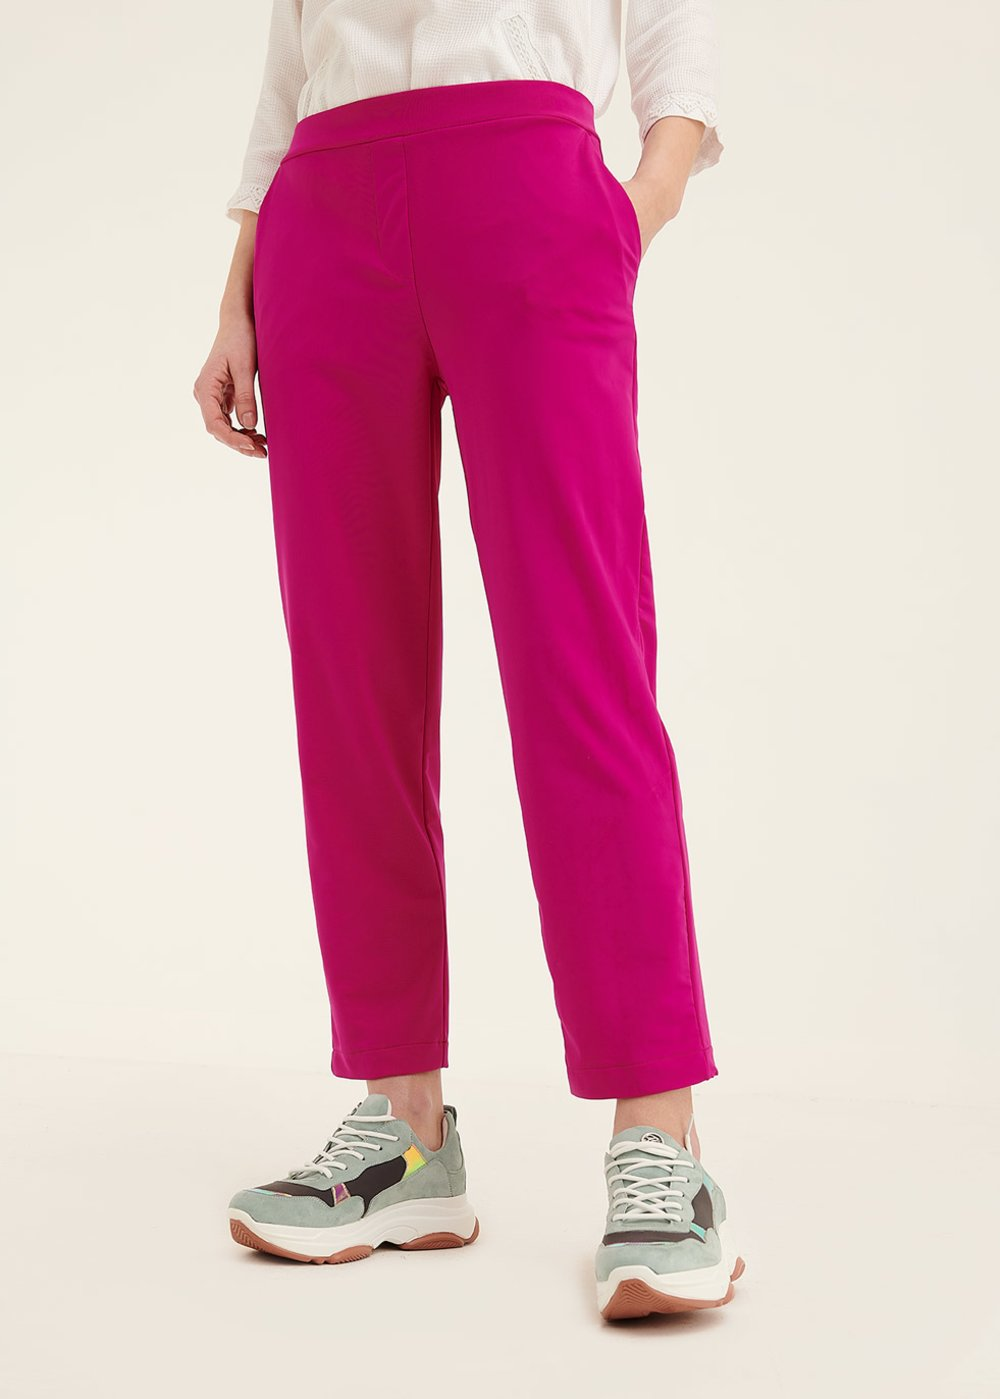 Cara elastic trousers in technical fabric - Rasberry - Woman